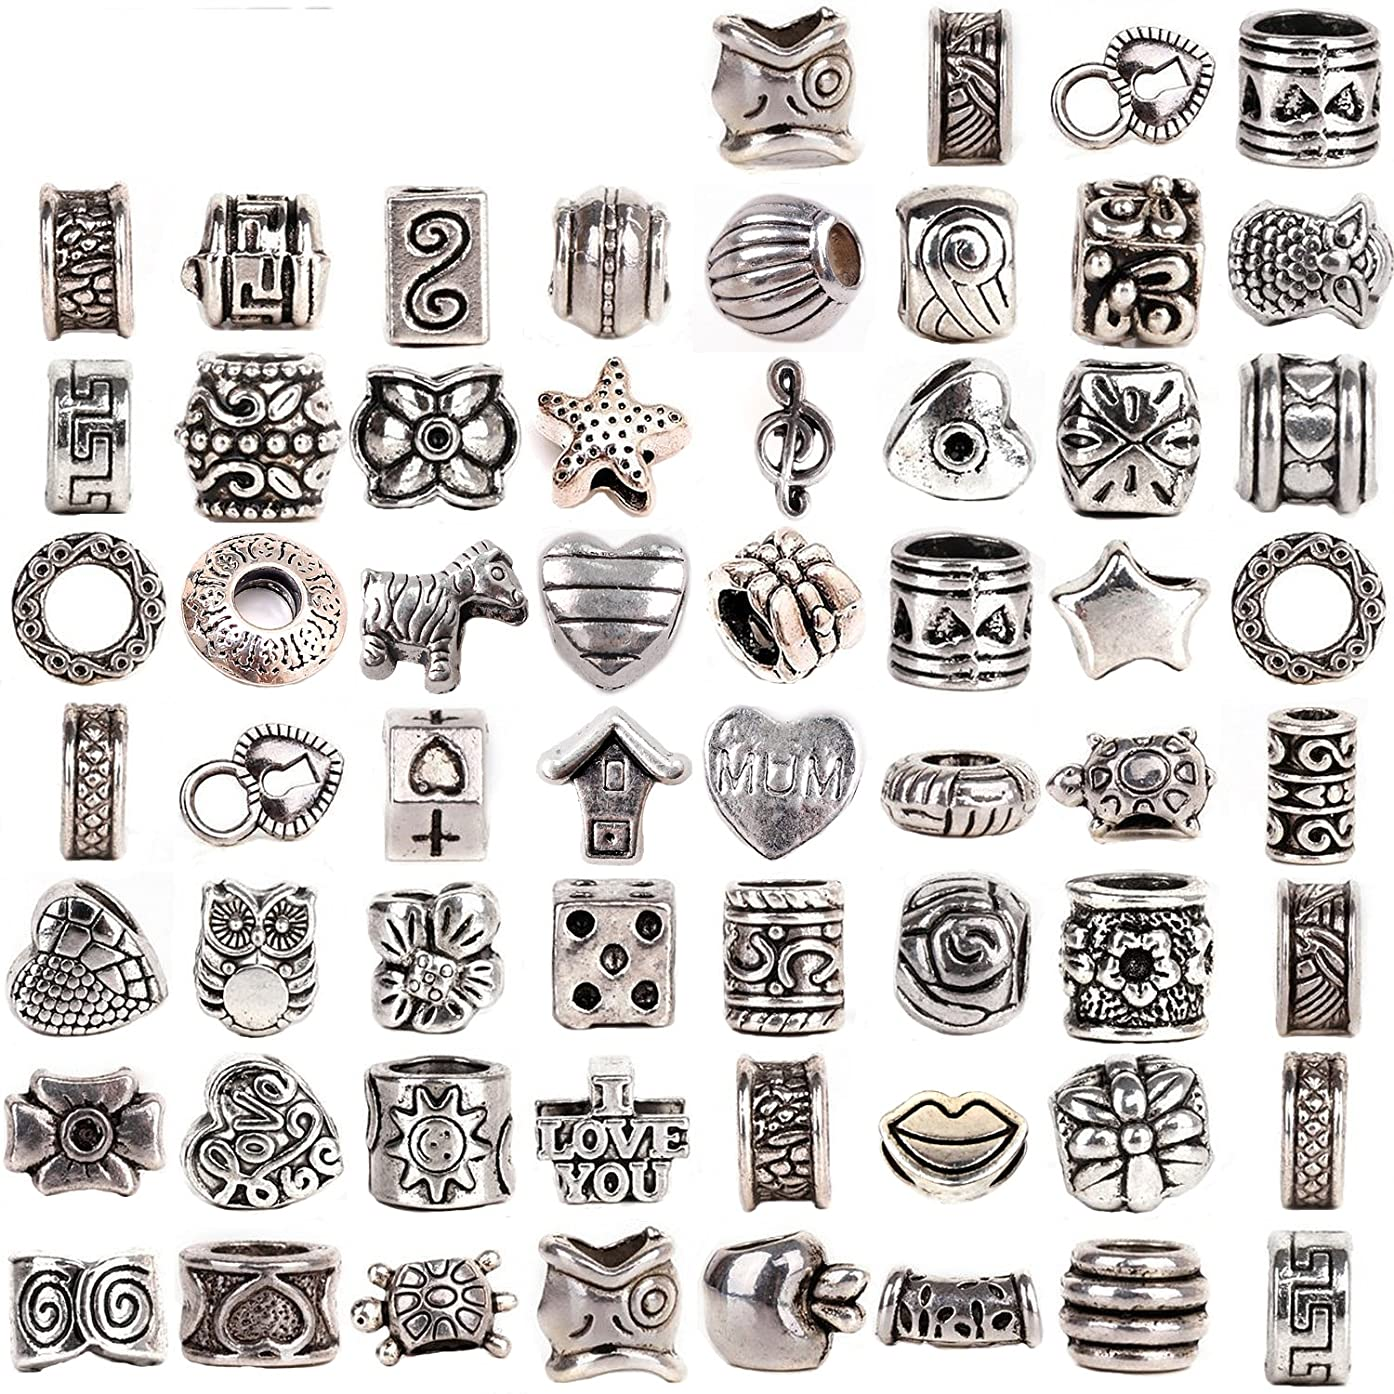 RUBYCA Tibetan Silver Tone Color Spacer Loose Beads Fit European Charm Bracelet Mix 120 Pcs Lot For DIY